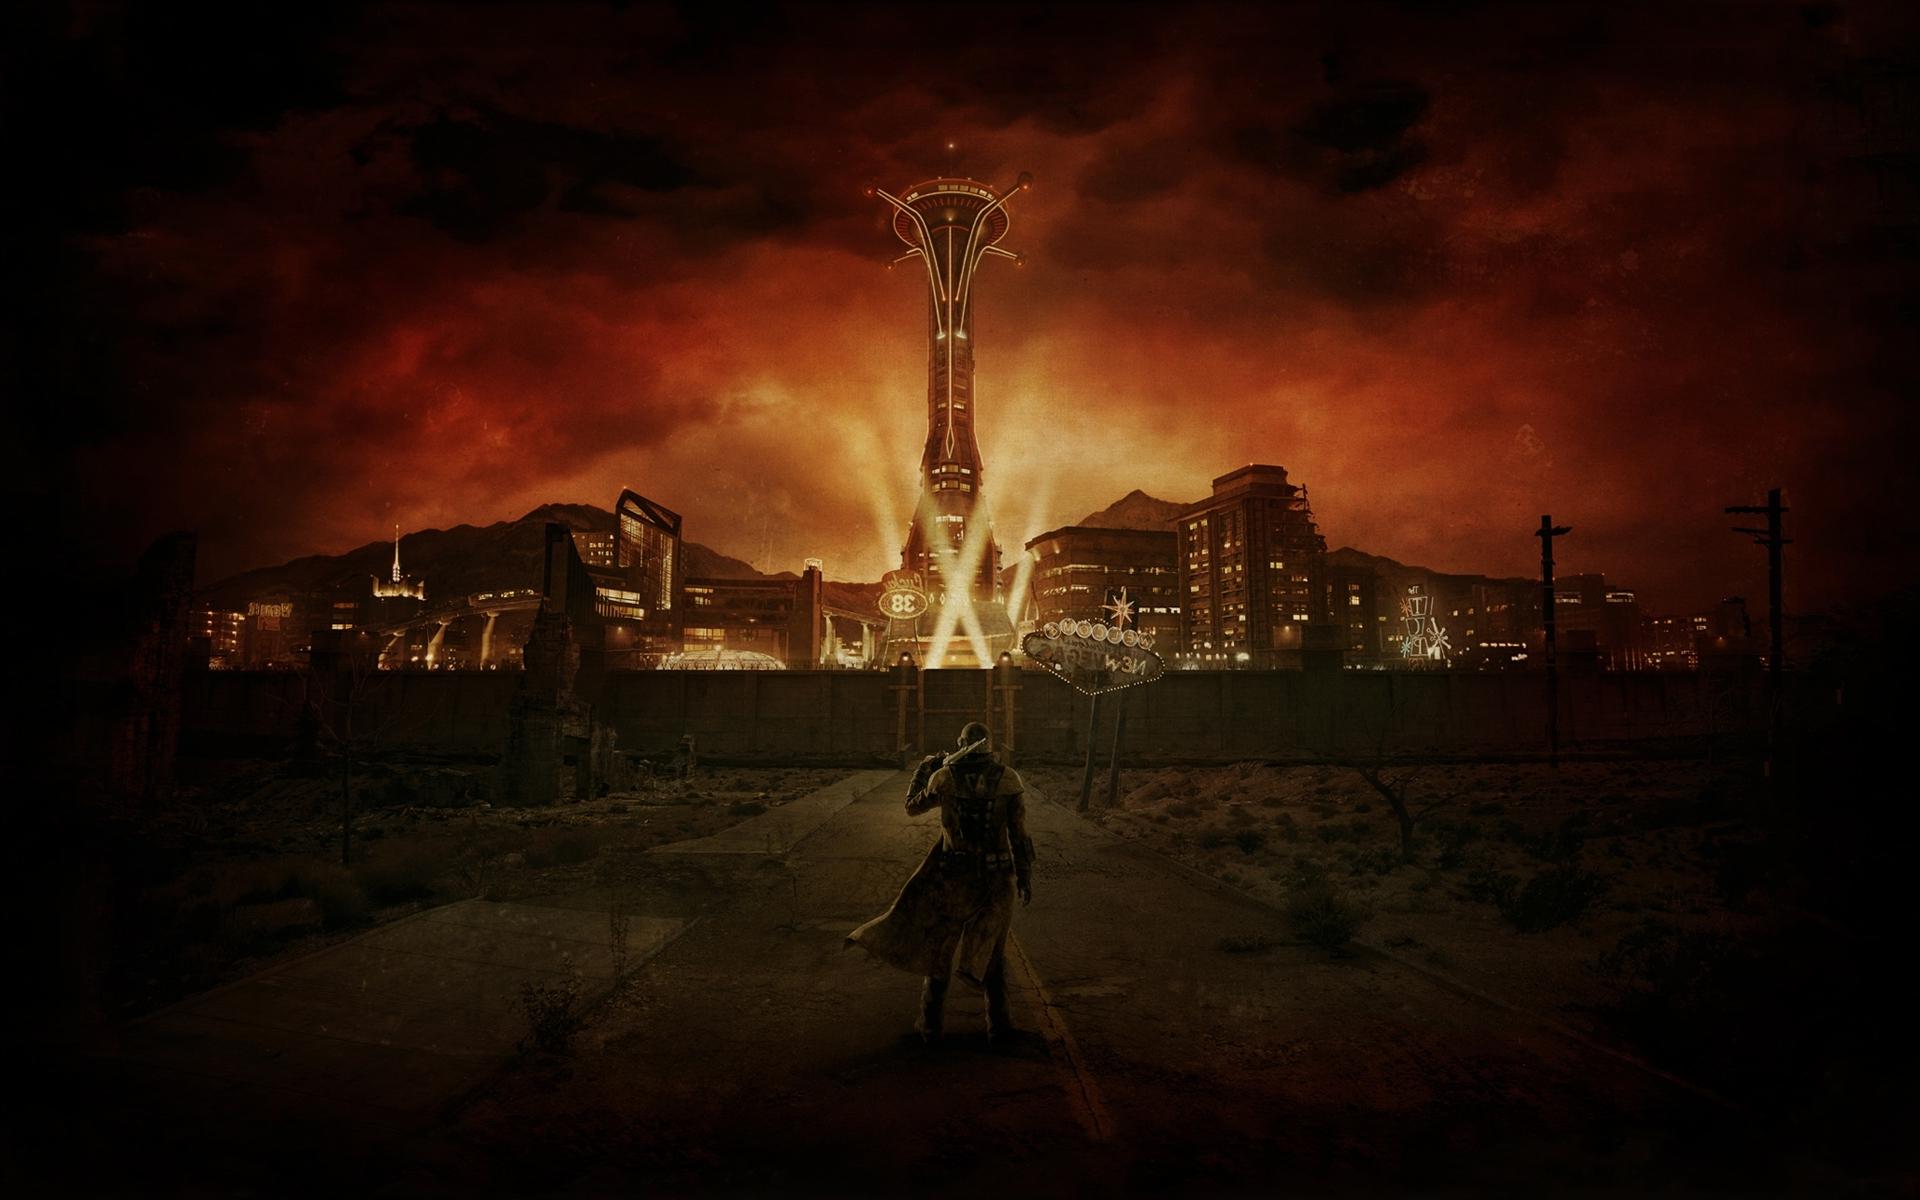 Wallpaper : Digital Art, Video Games, Night, Apocalyptic